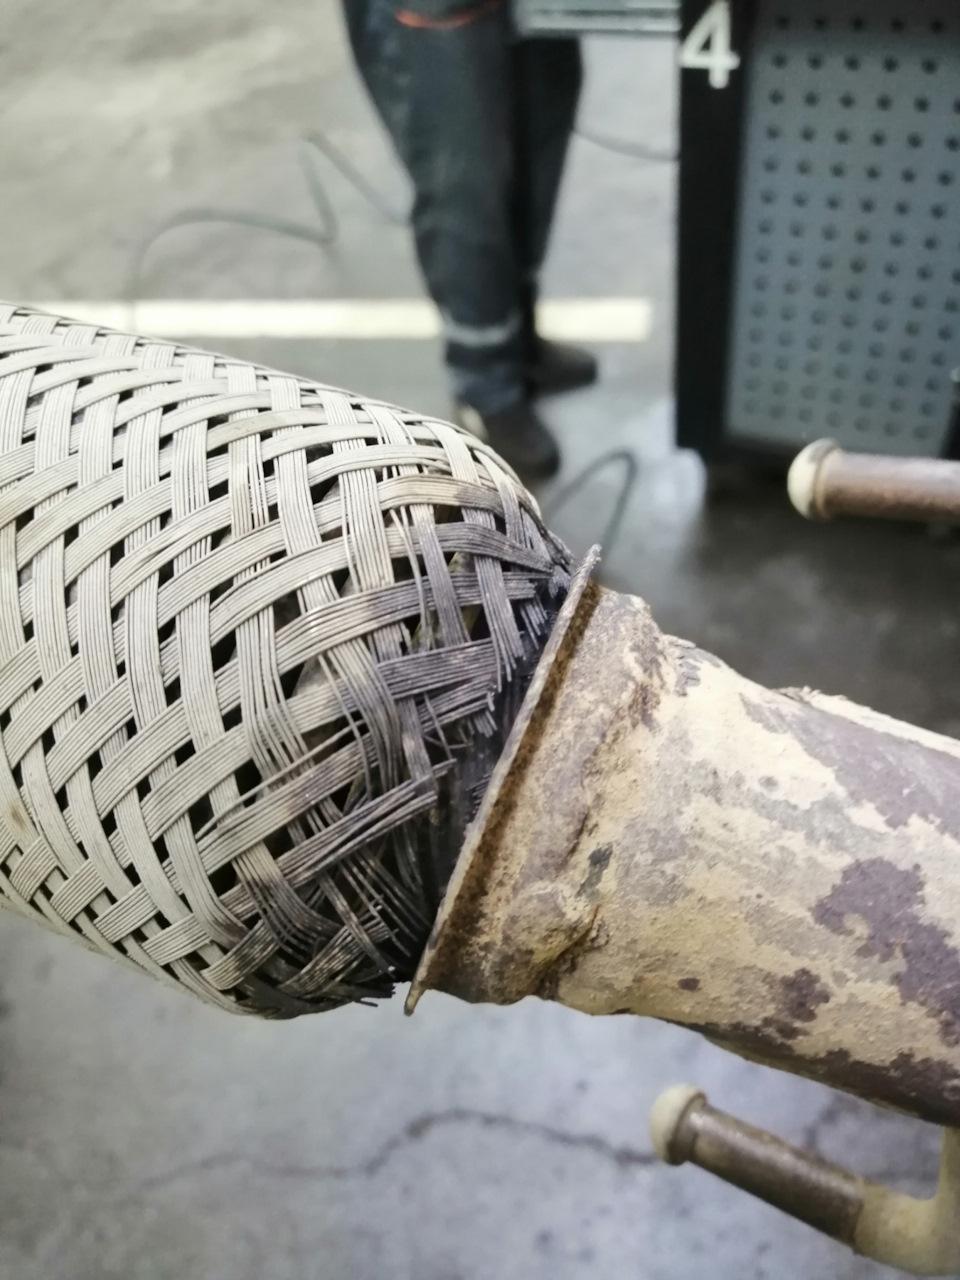 Гофра глушителя Лада Ларгус 8 и 16 клапанов замена, артикул, размеры